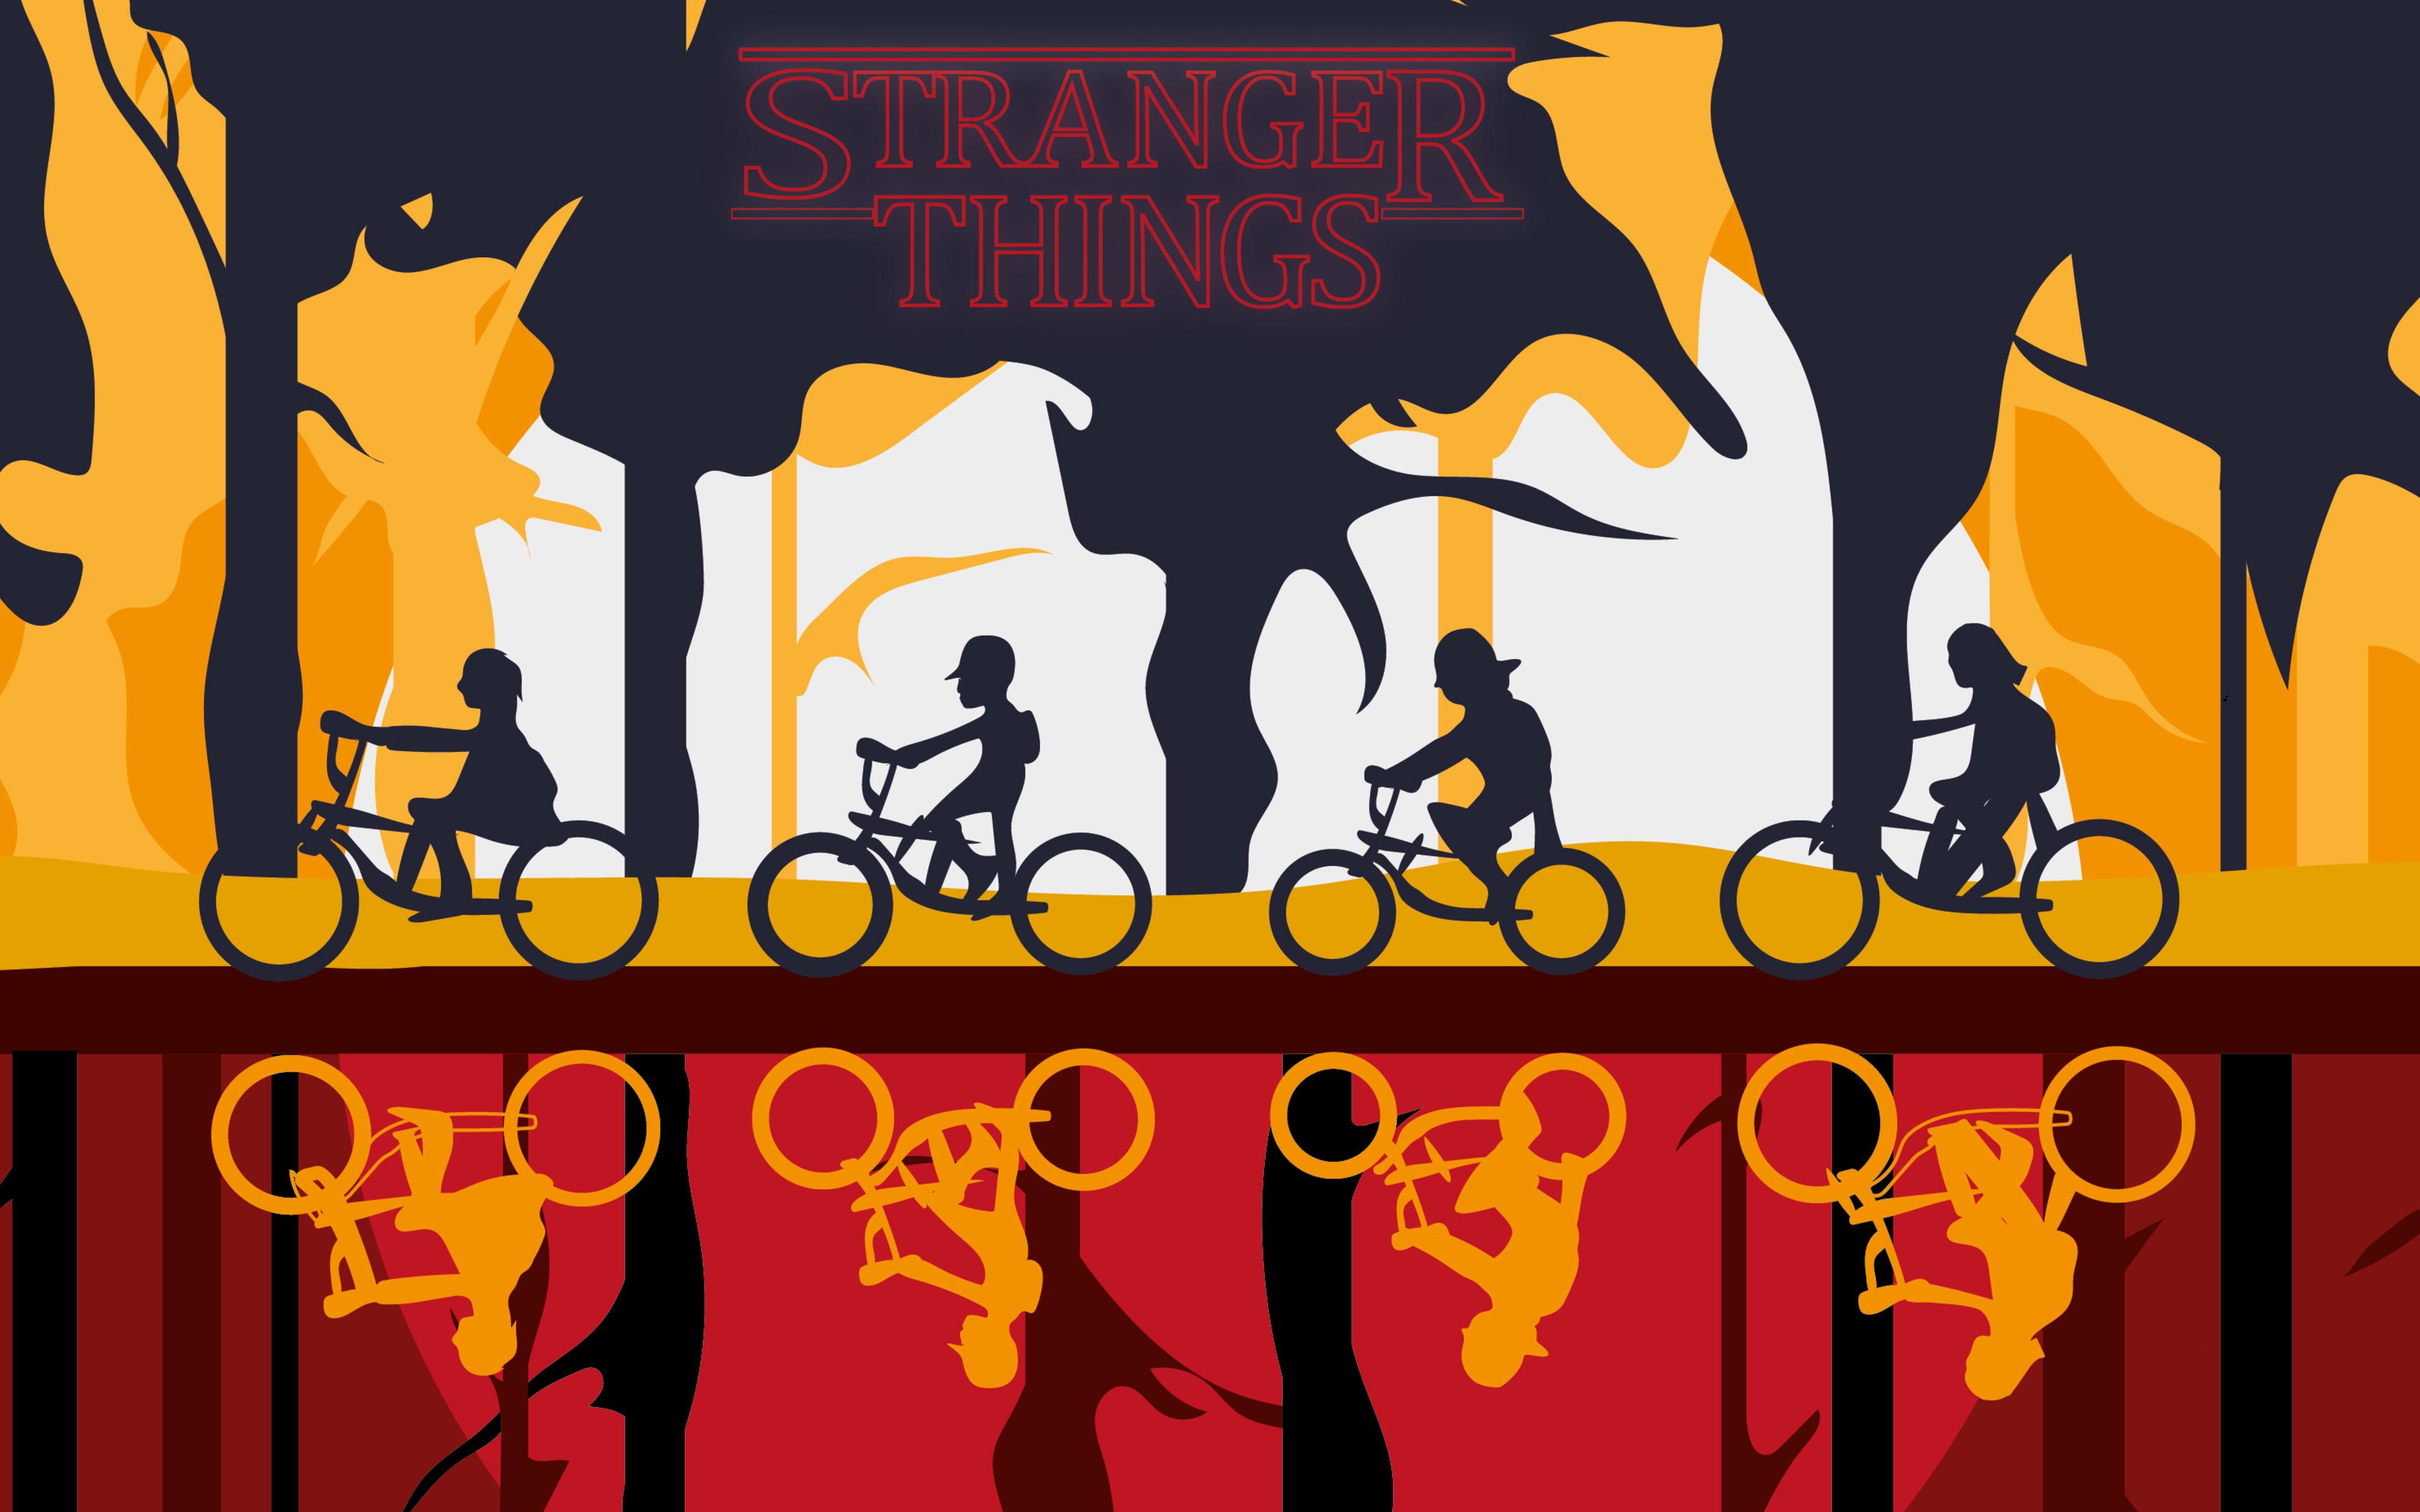 stranger-things-season-3-art-a5.jpg